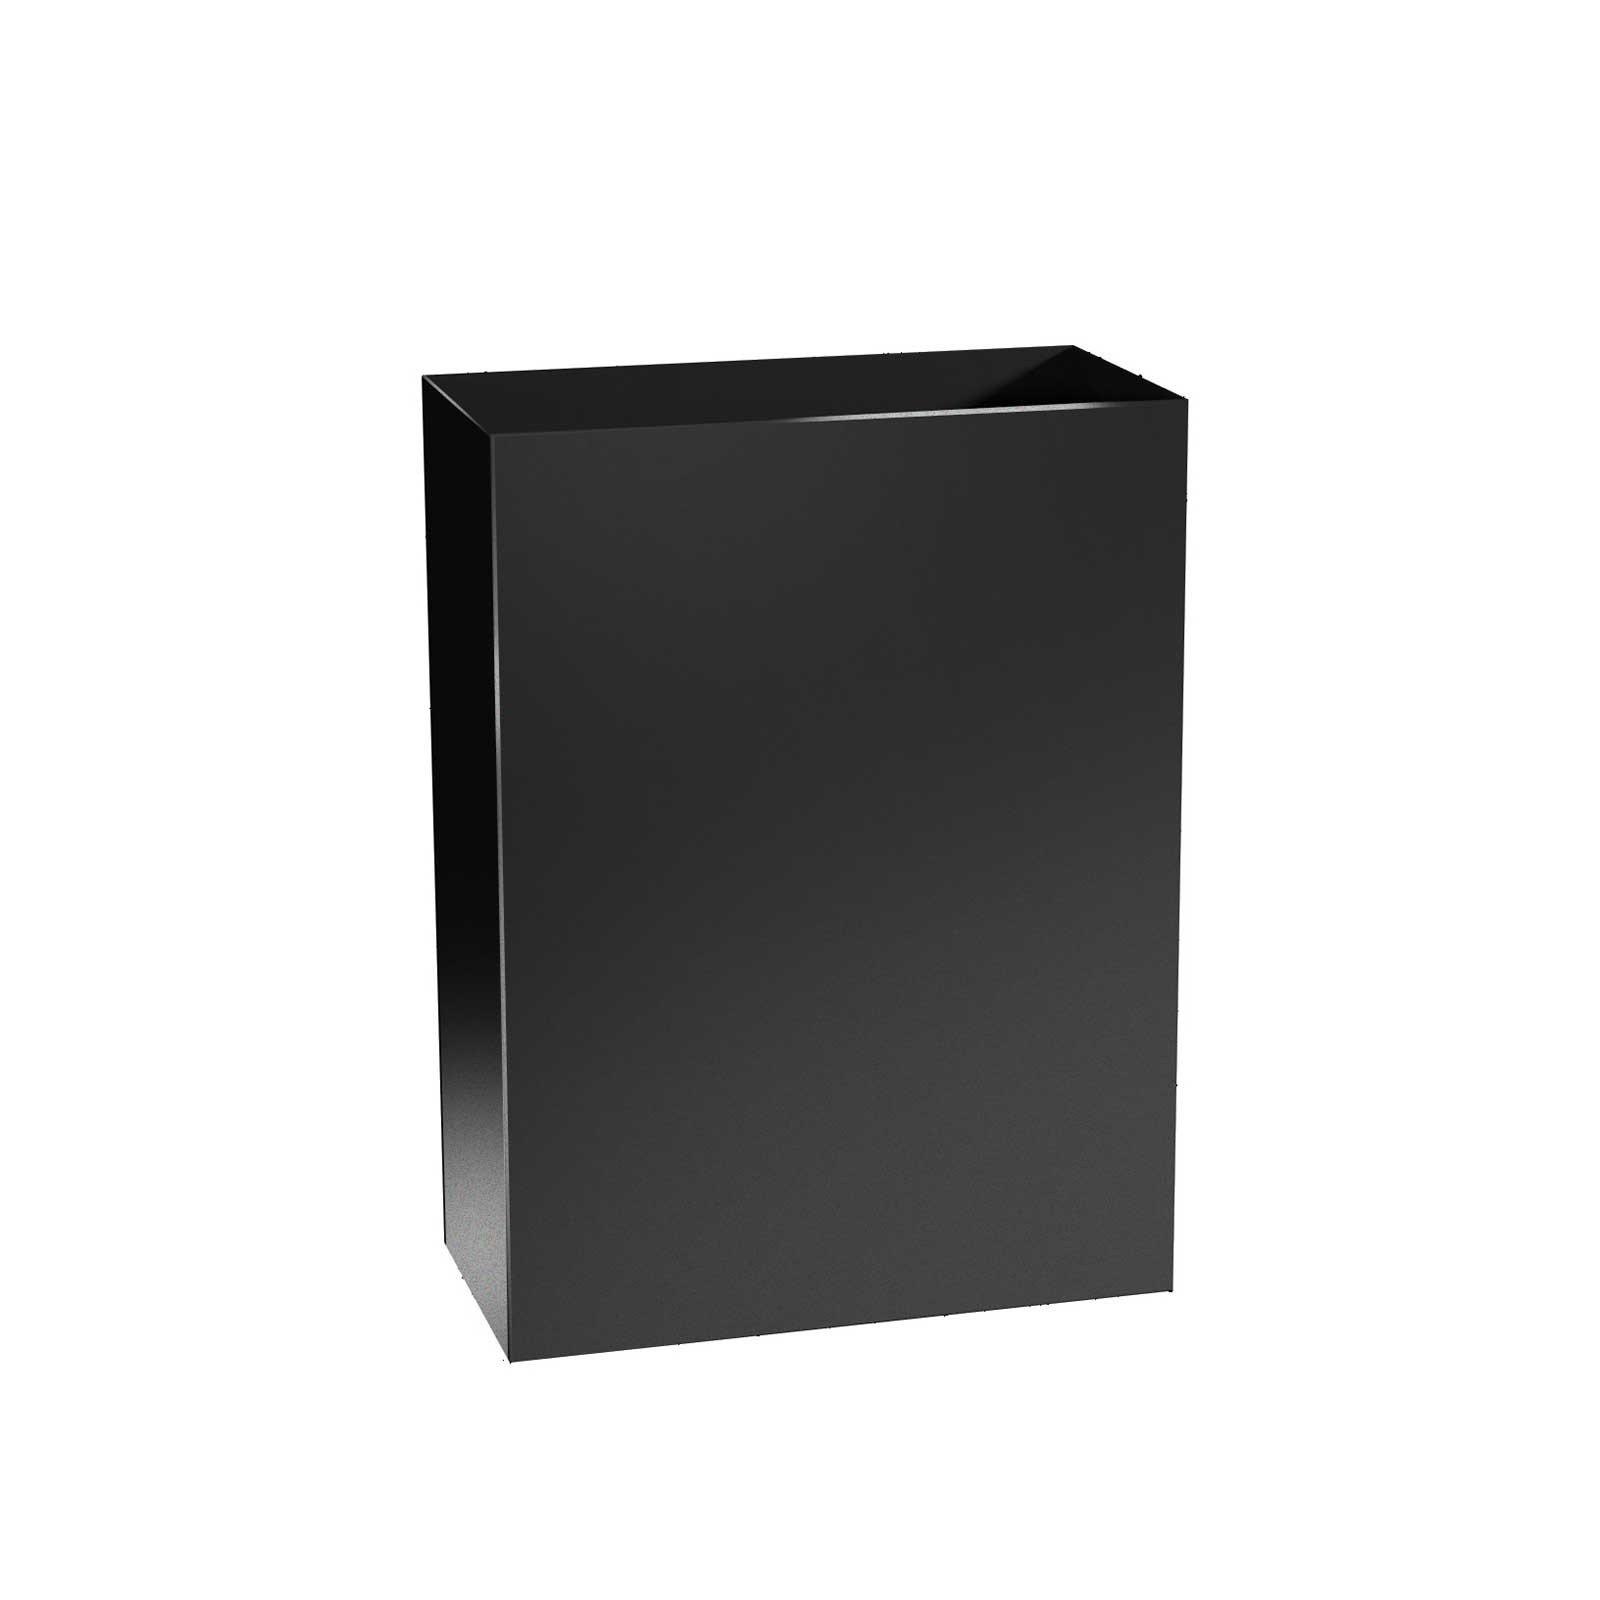 Tall Metal Planters - Aluminum - 32' Tall, (18'/24' Length, 12' Width)